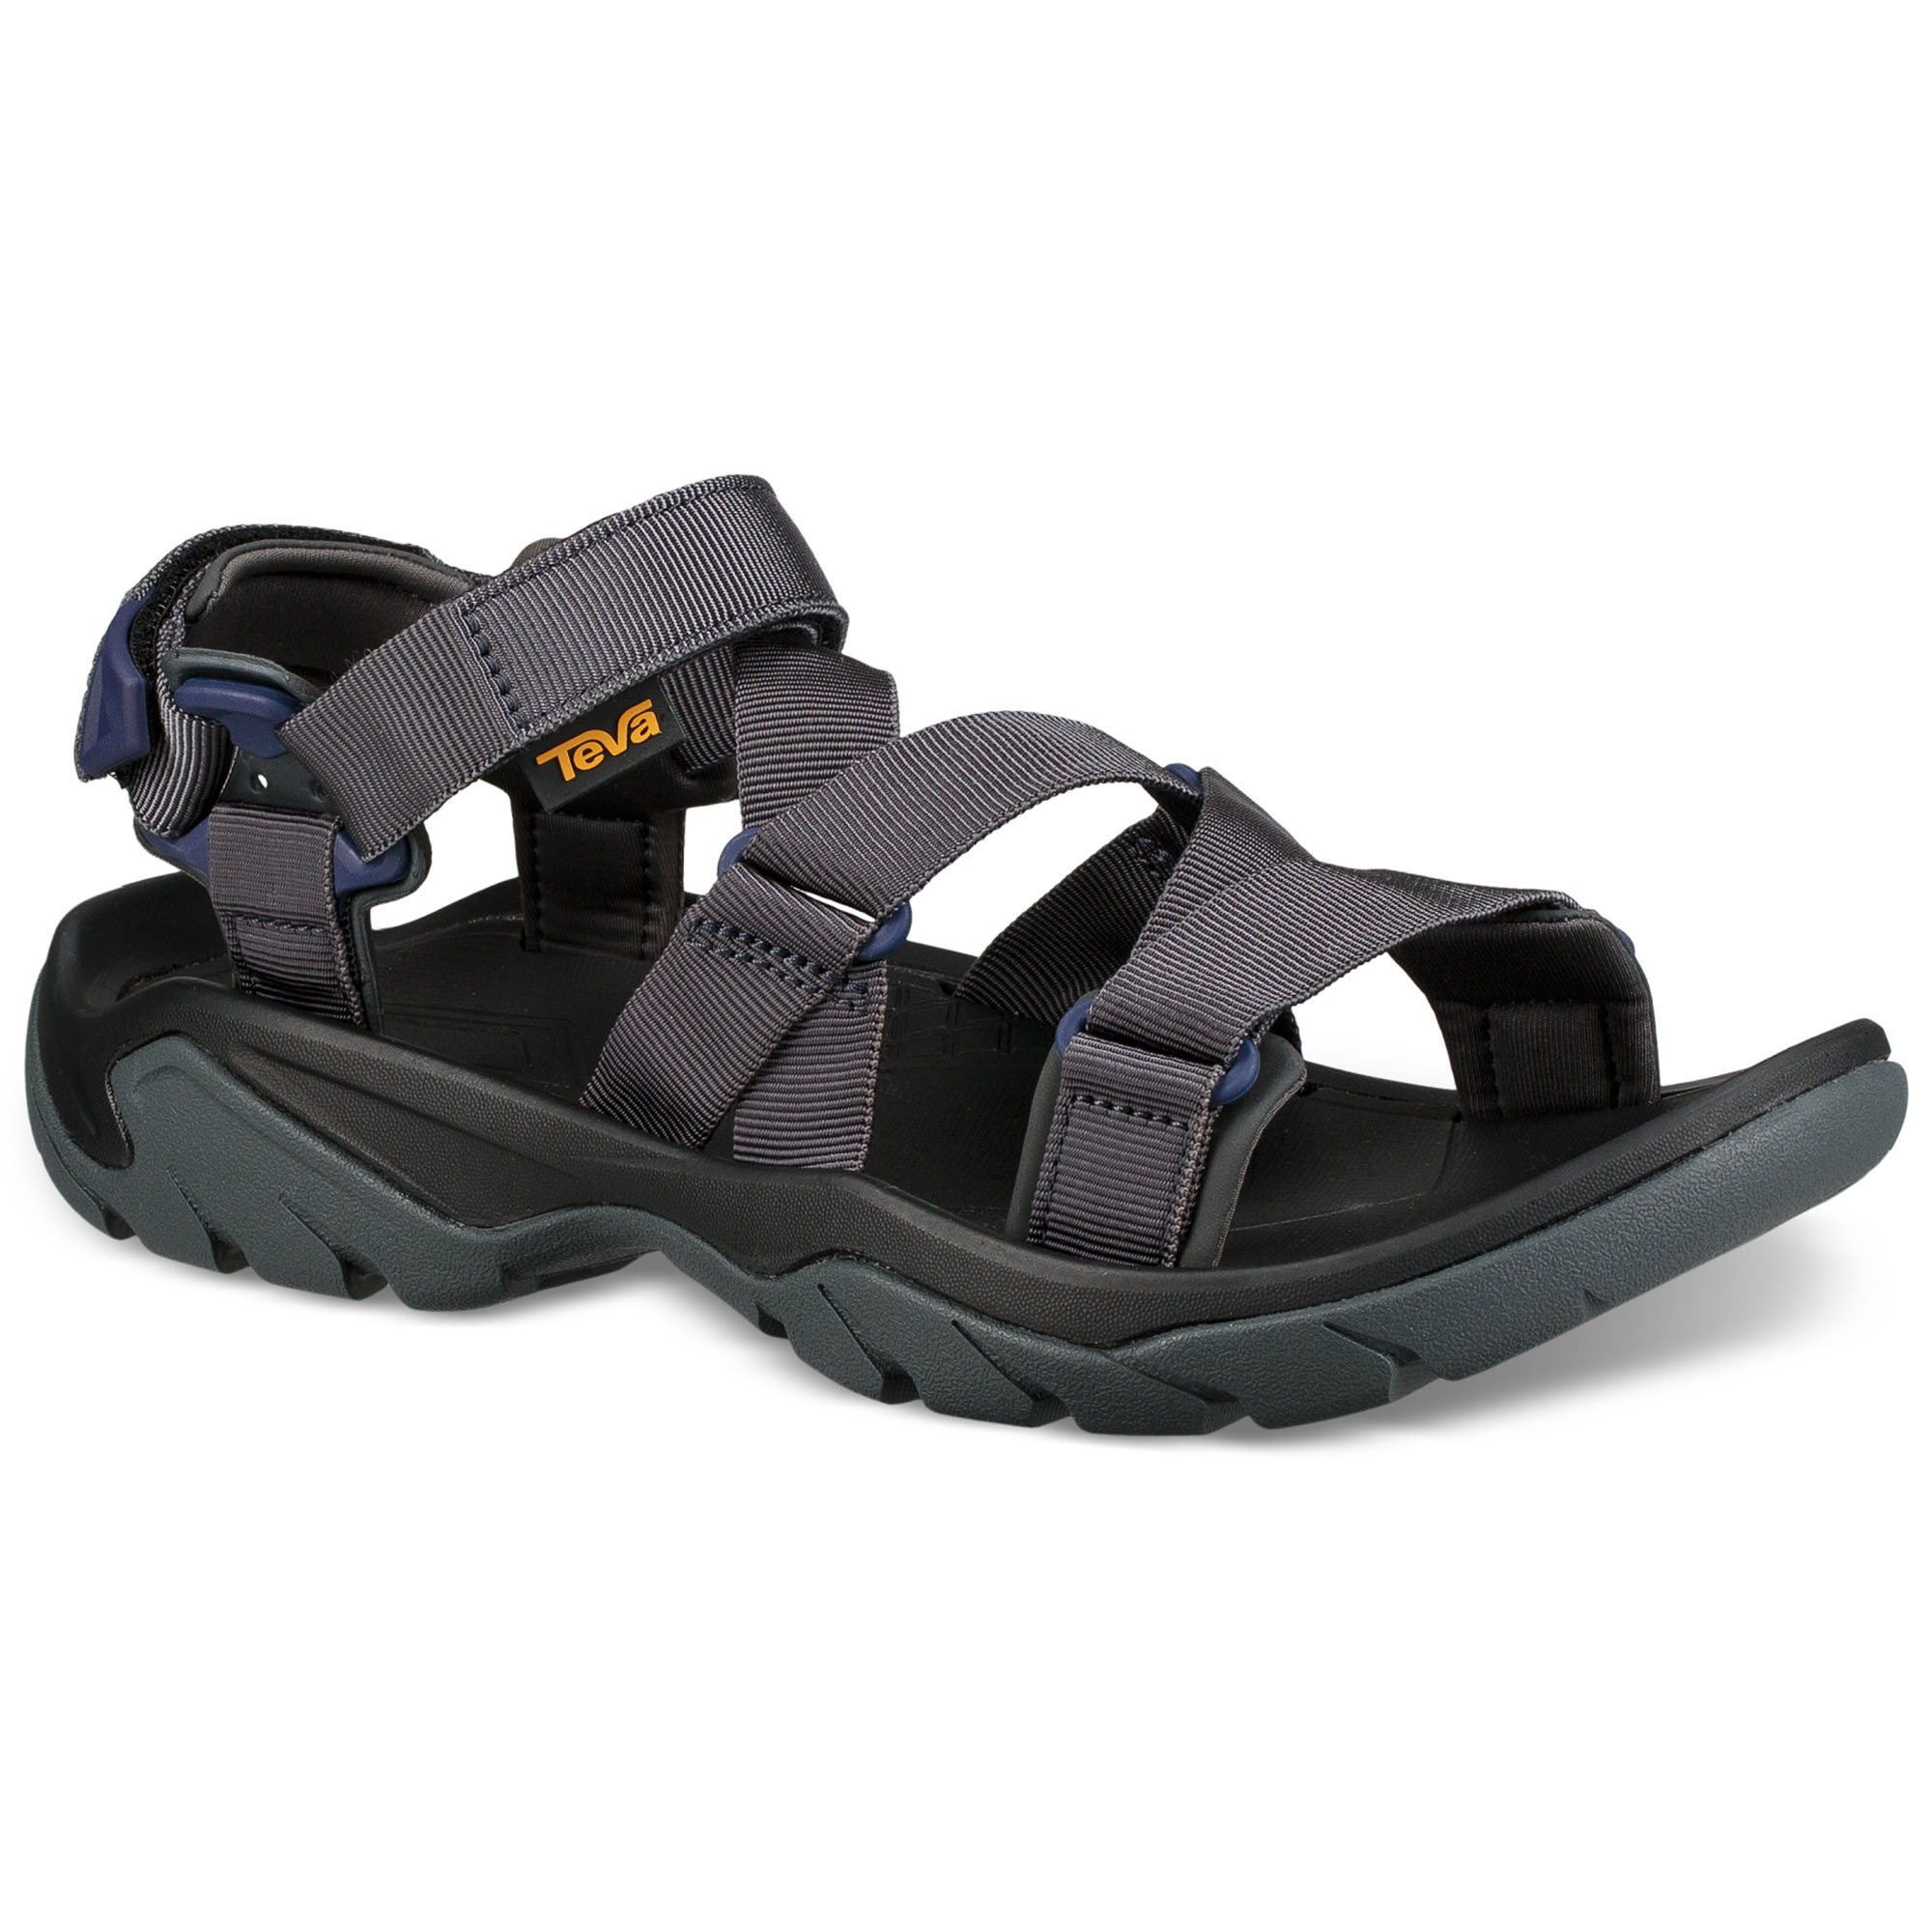 746523ab0a74 teva hiking sandals philippines teva sandals hiking